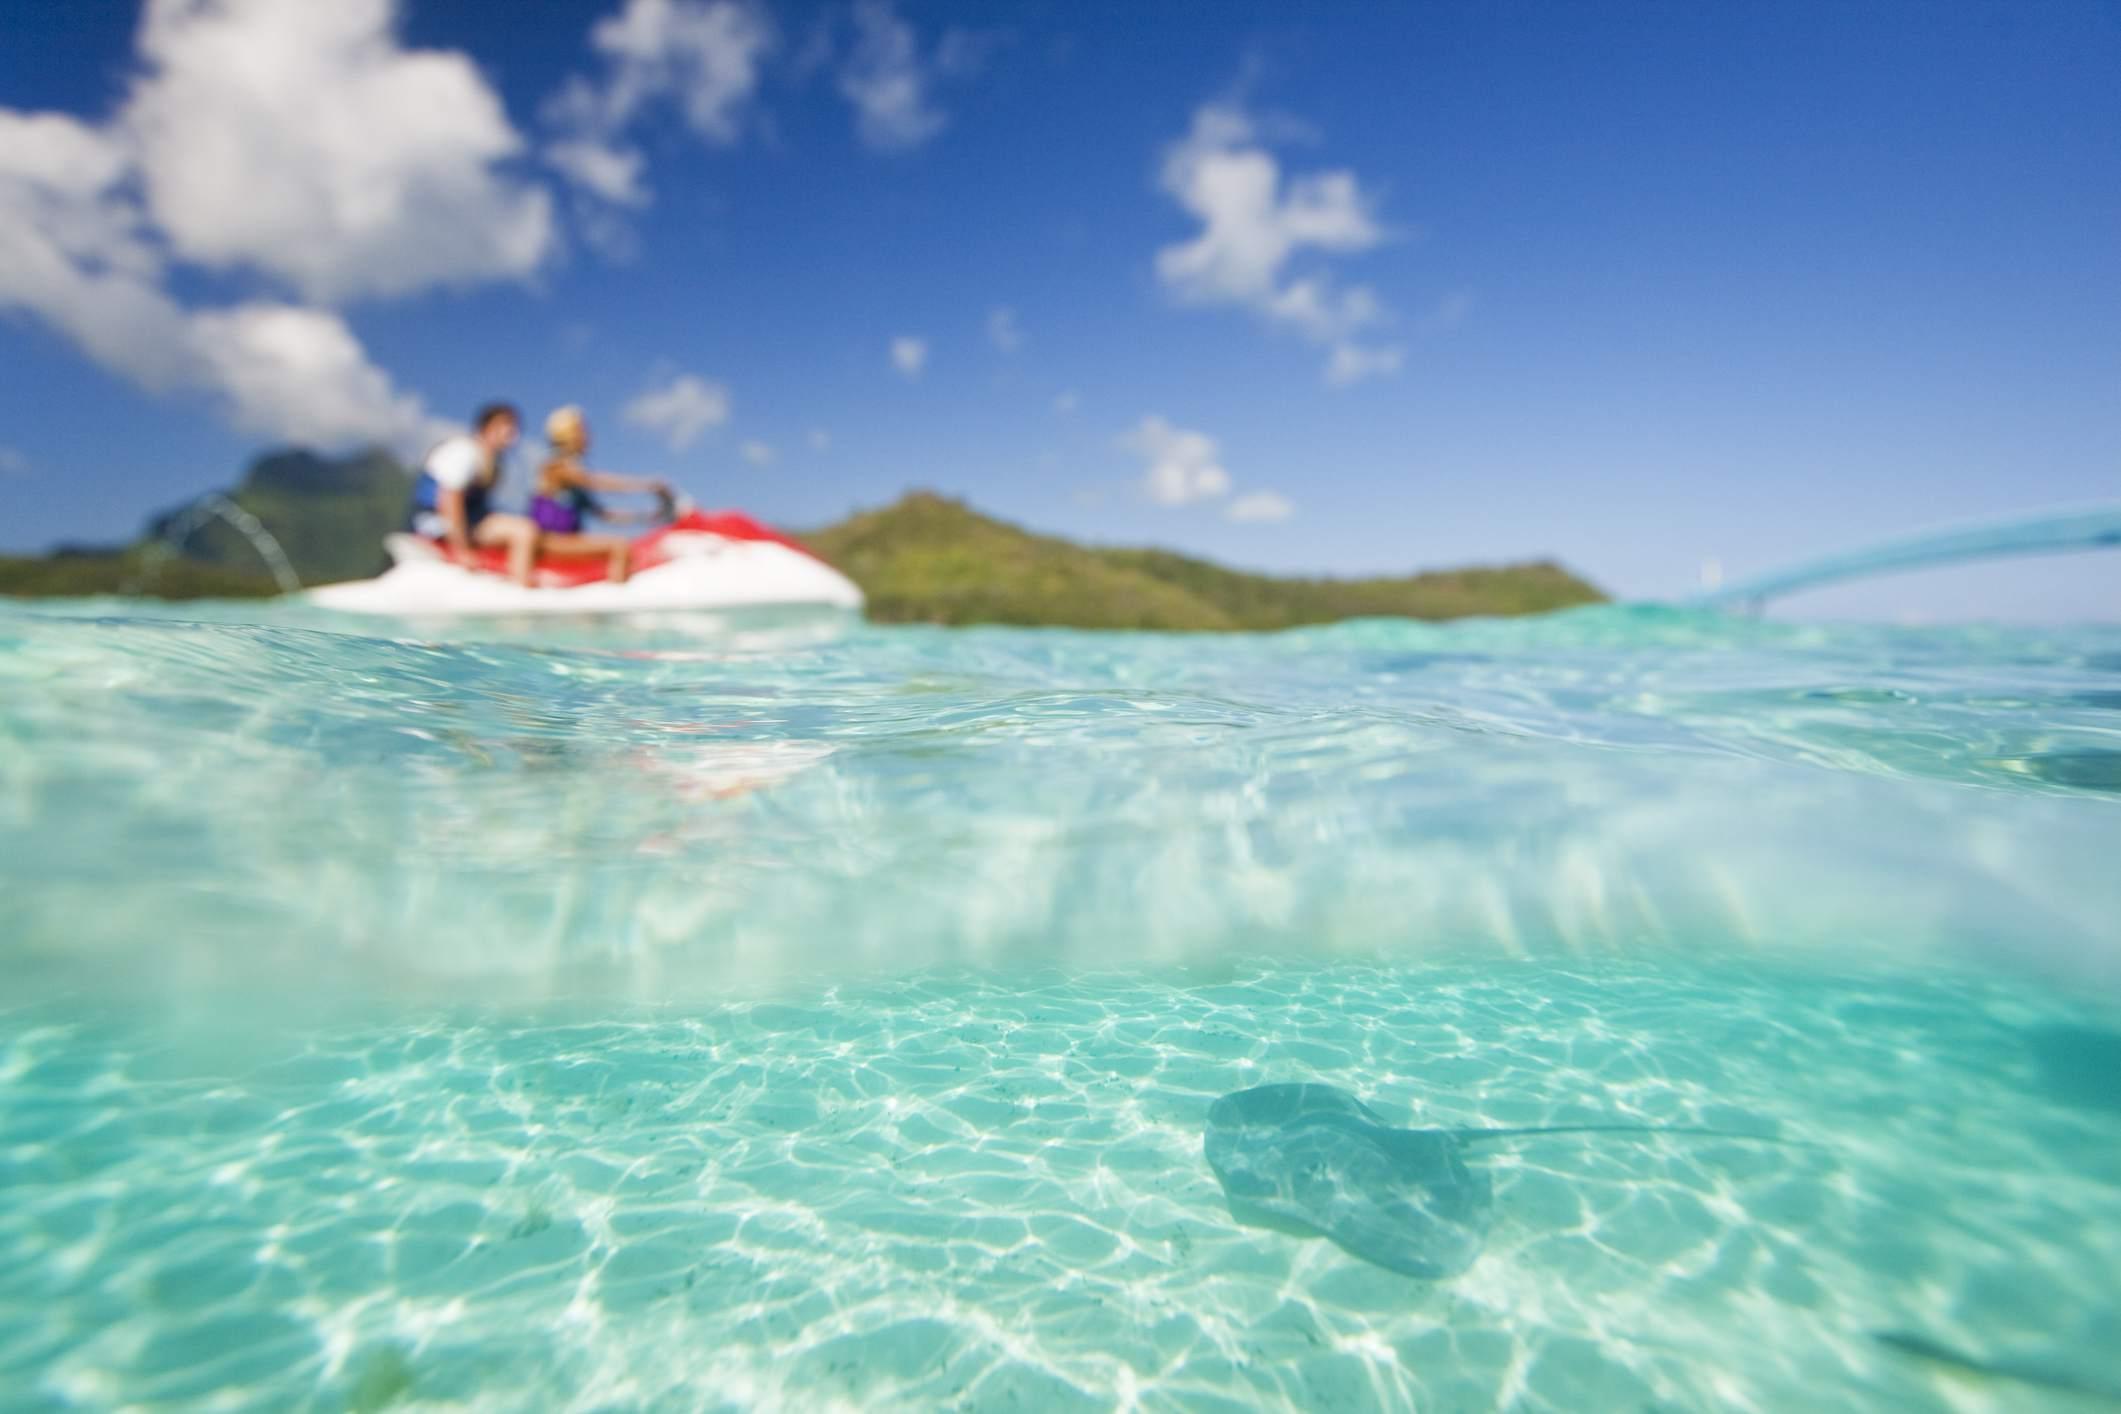 Waterscooter passing by stingray swimming on floor of Bora Bora Lagoon.